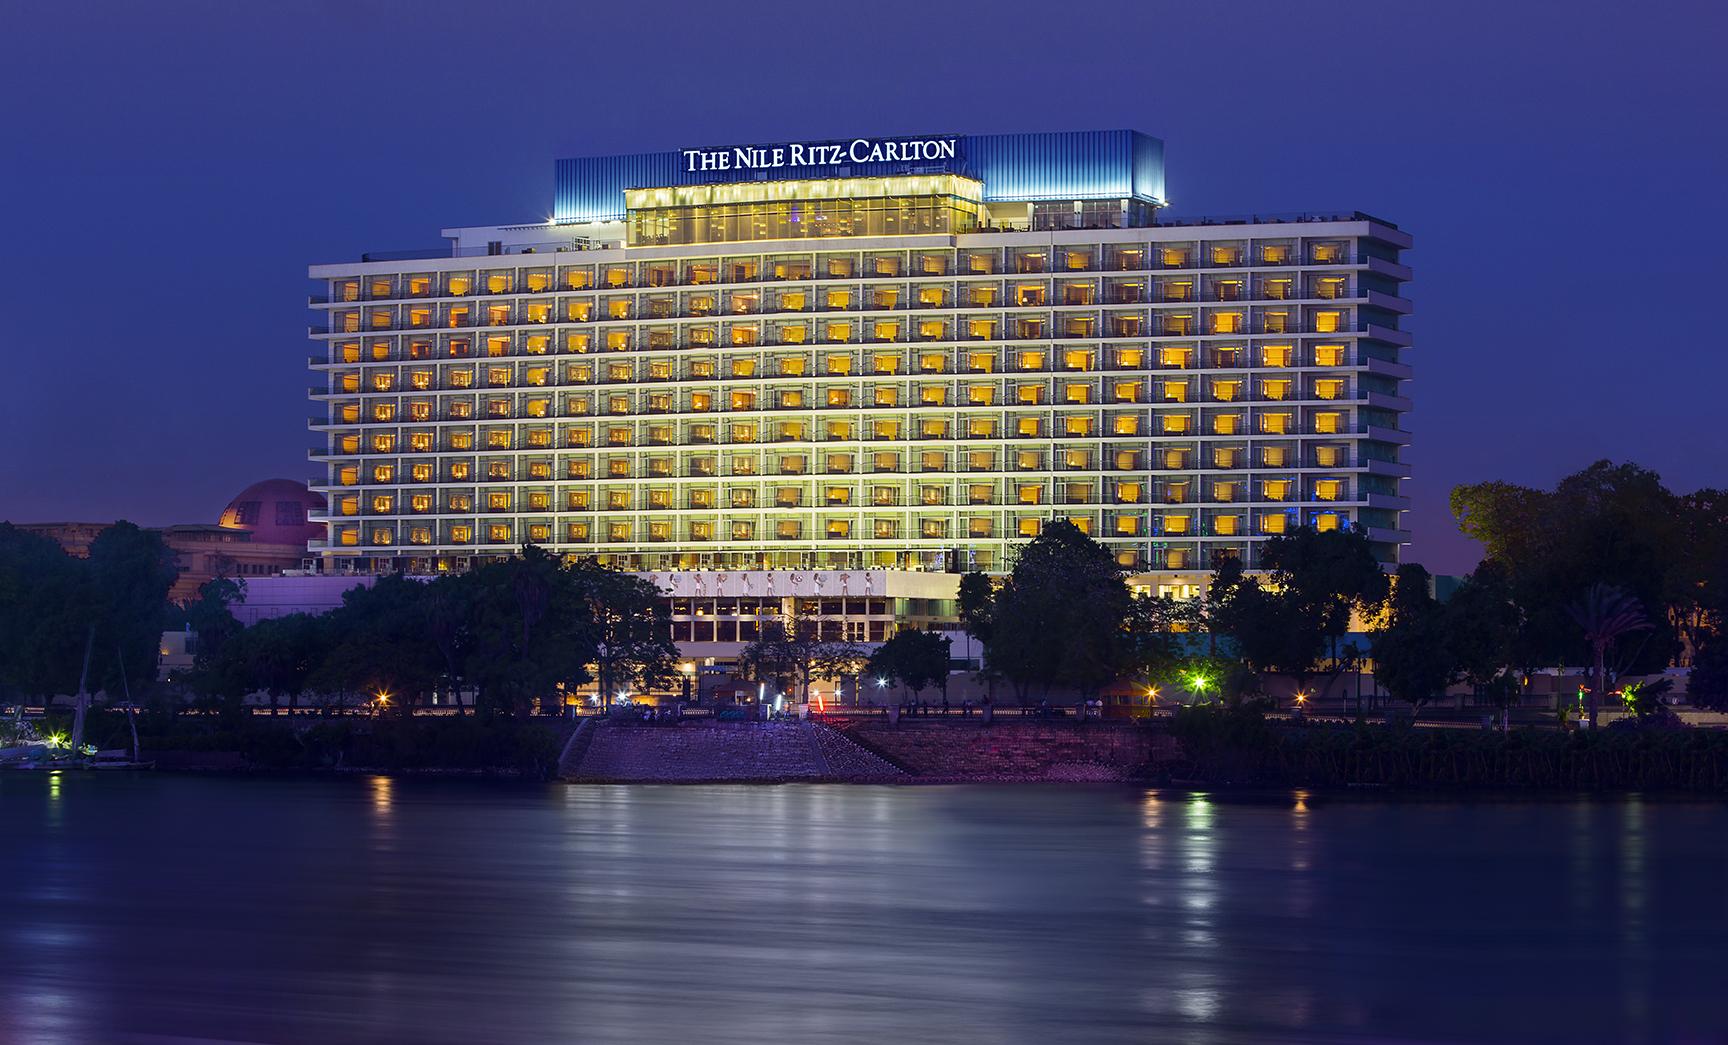 The Nile Ritz Carlton